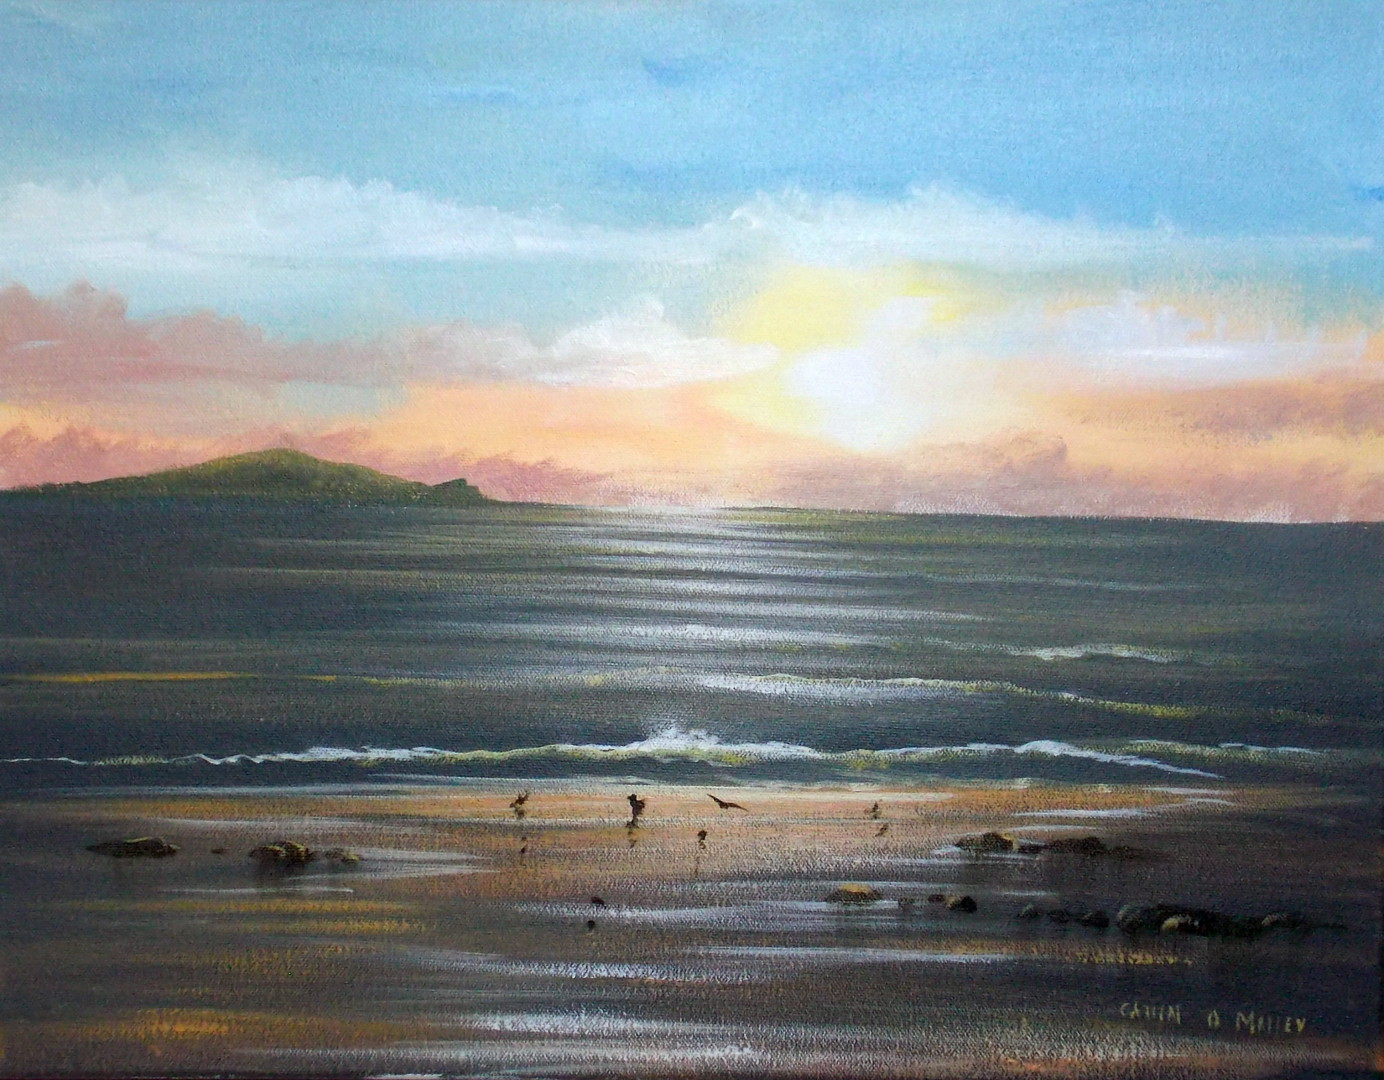 Cathal O Malley - cruagh  islannd sunset